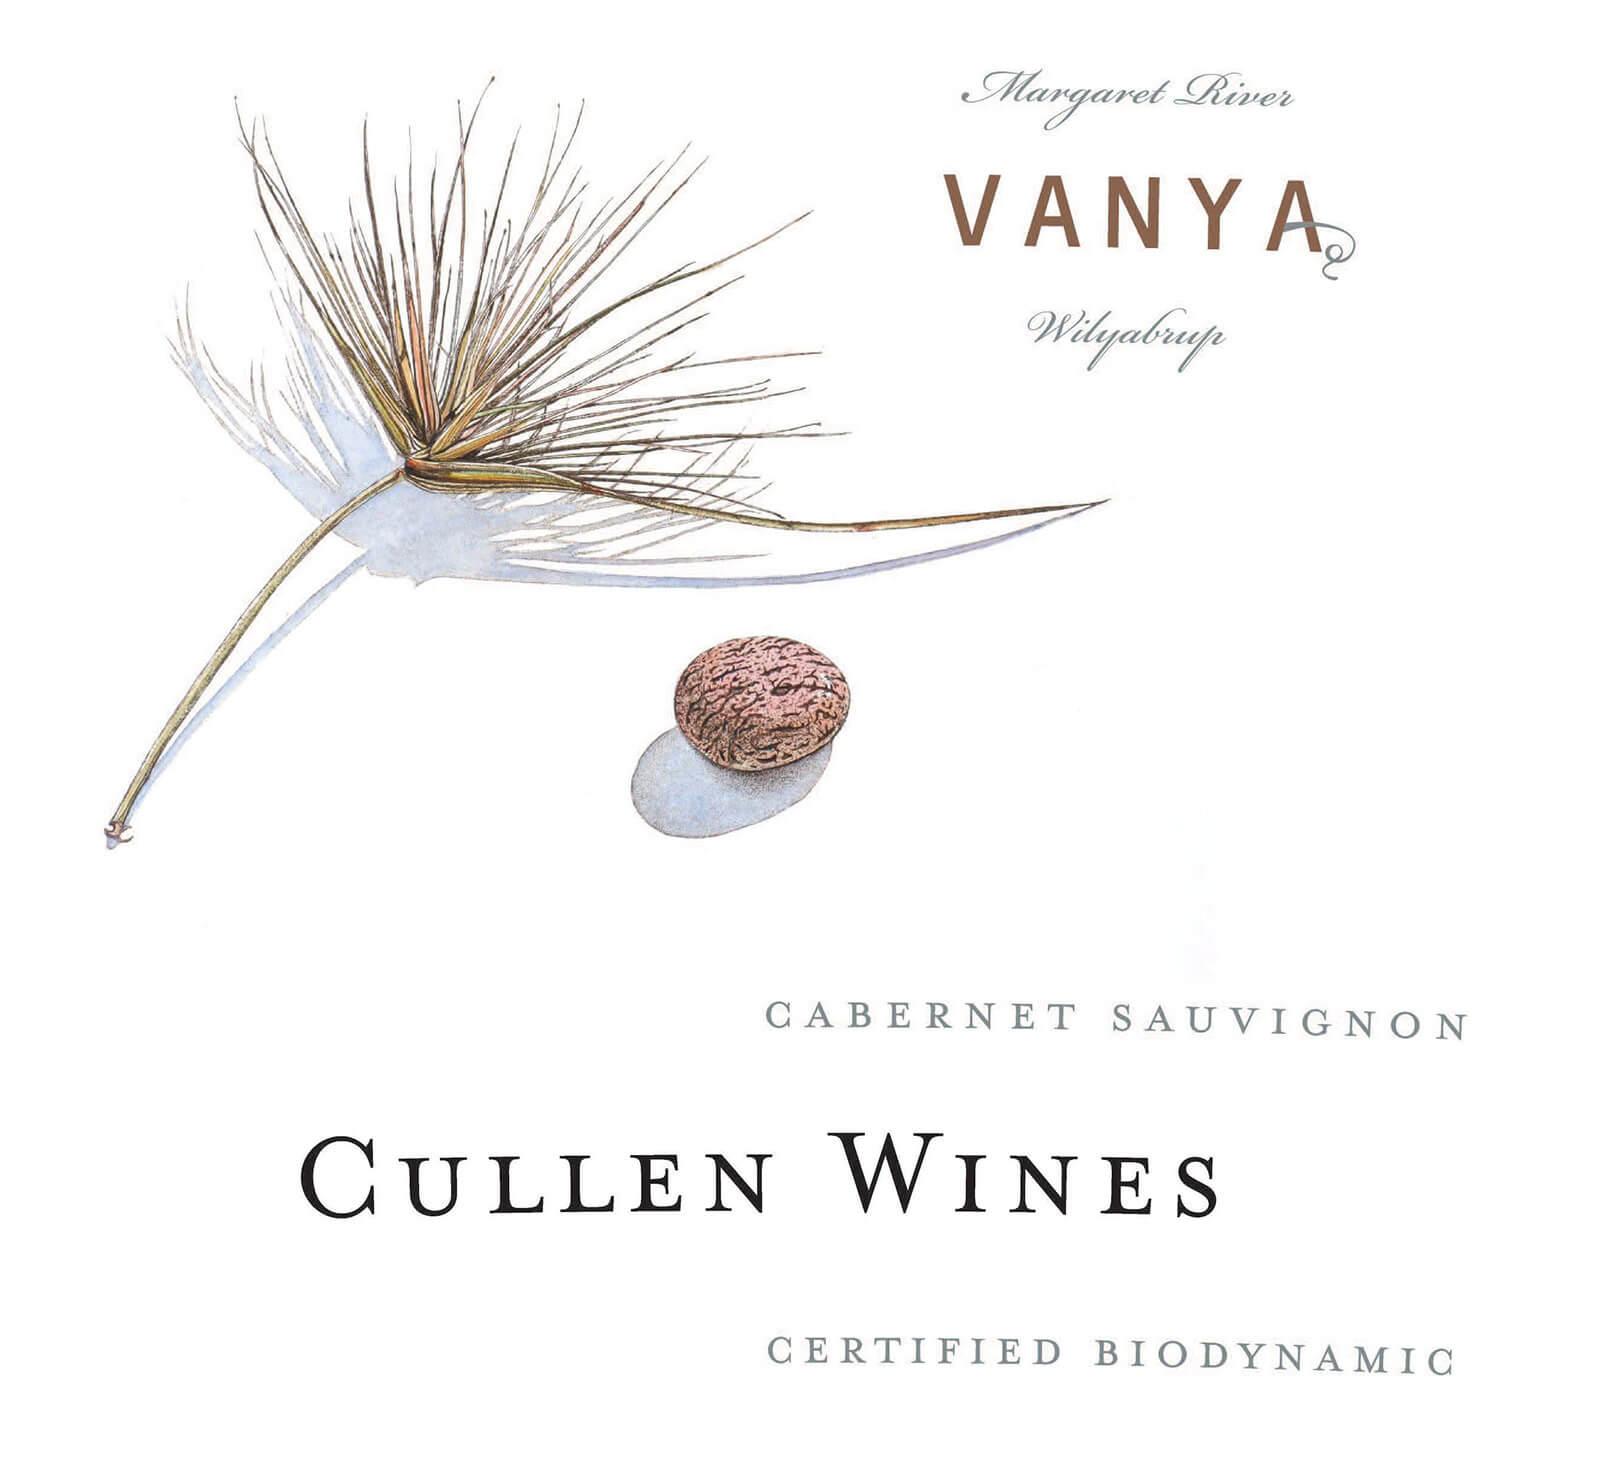 Label of the Cullen Vanya Margaret River cabernet sauvignon